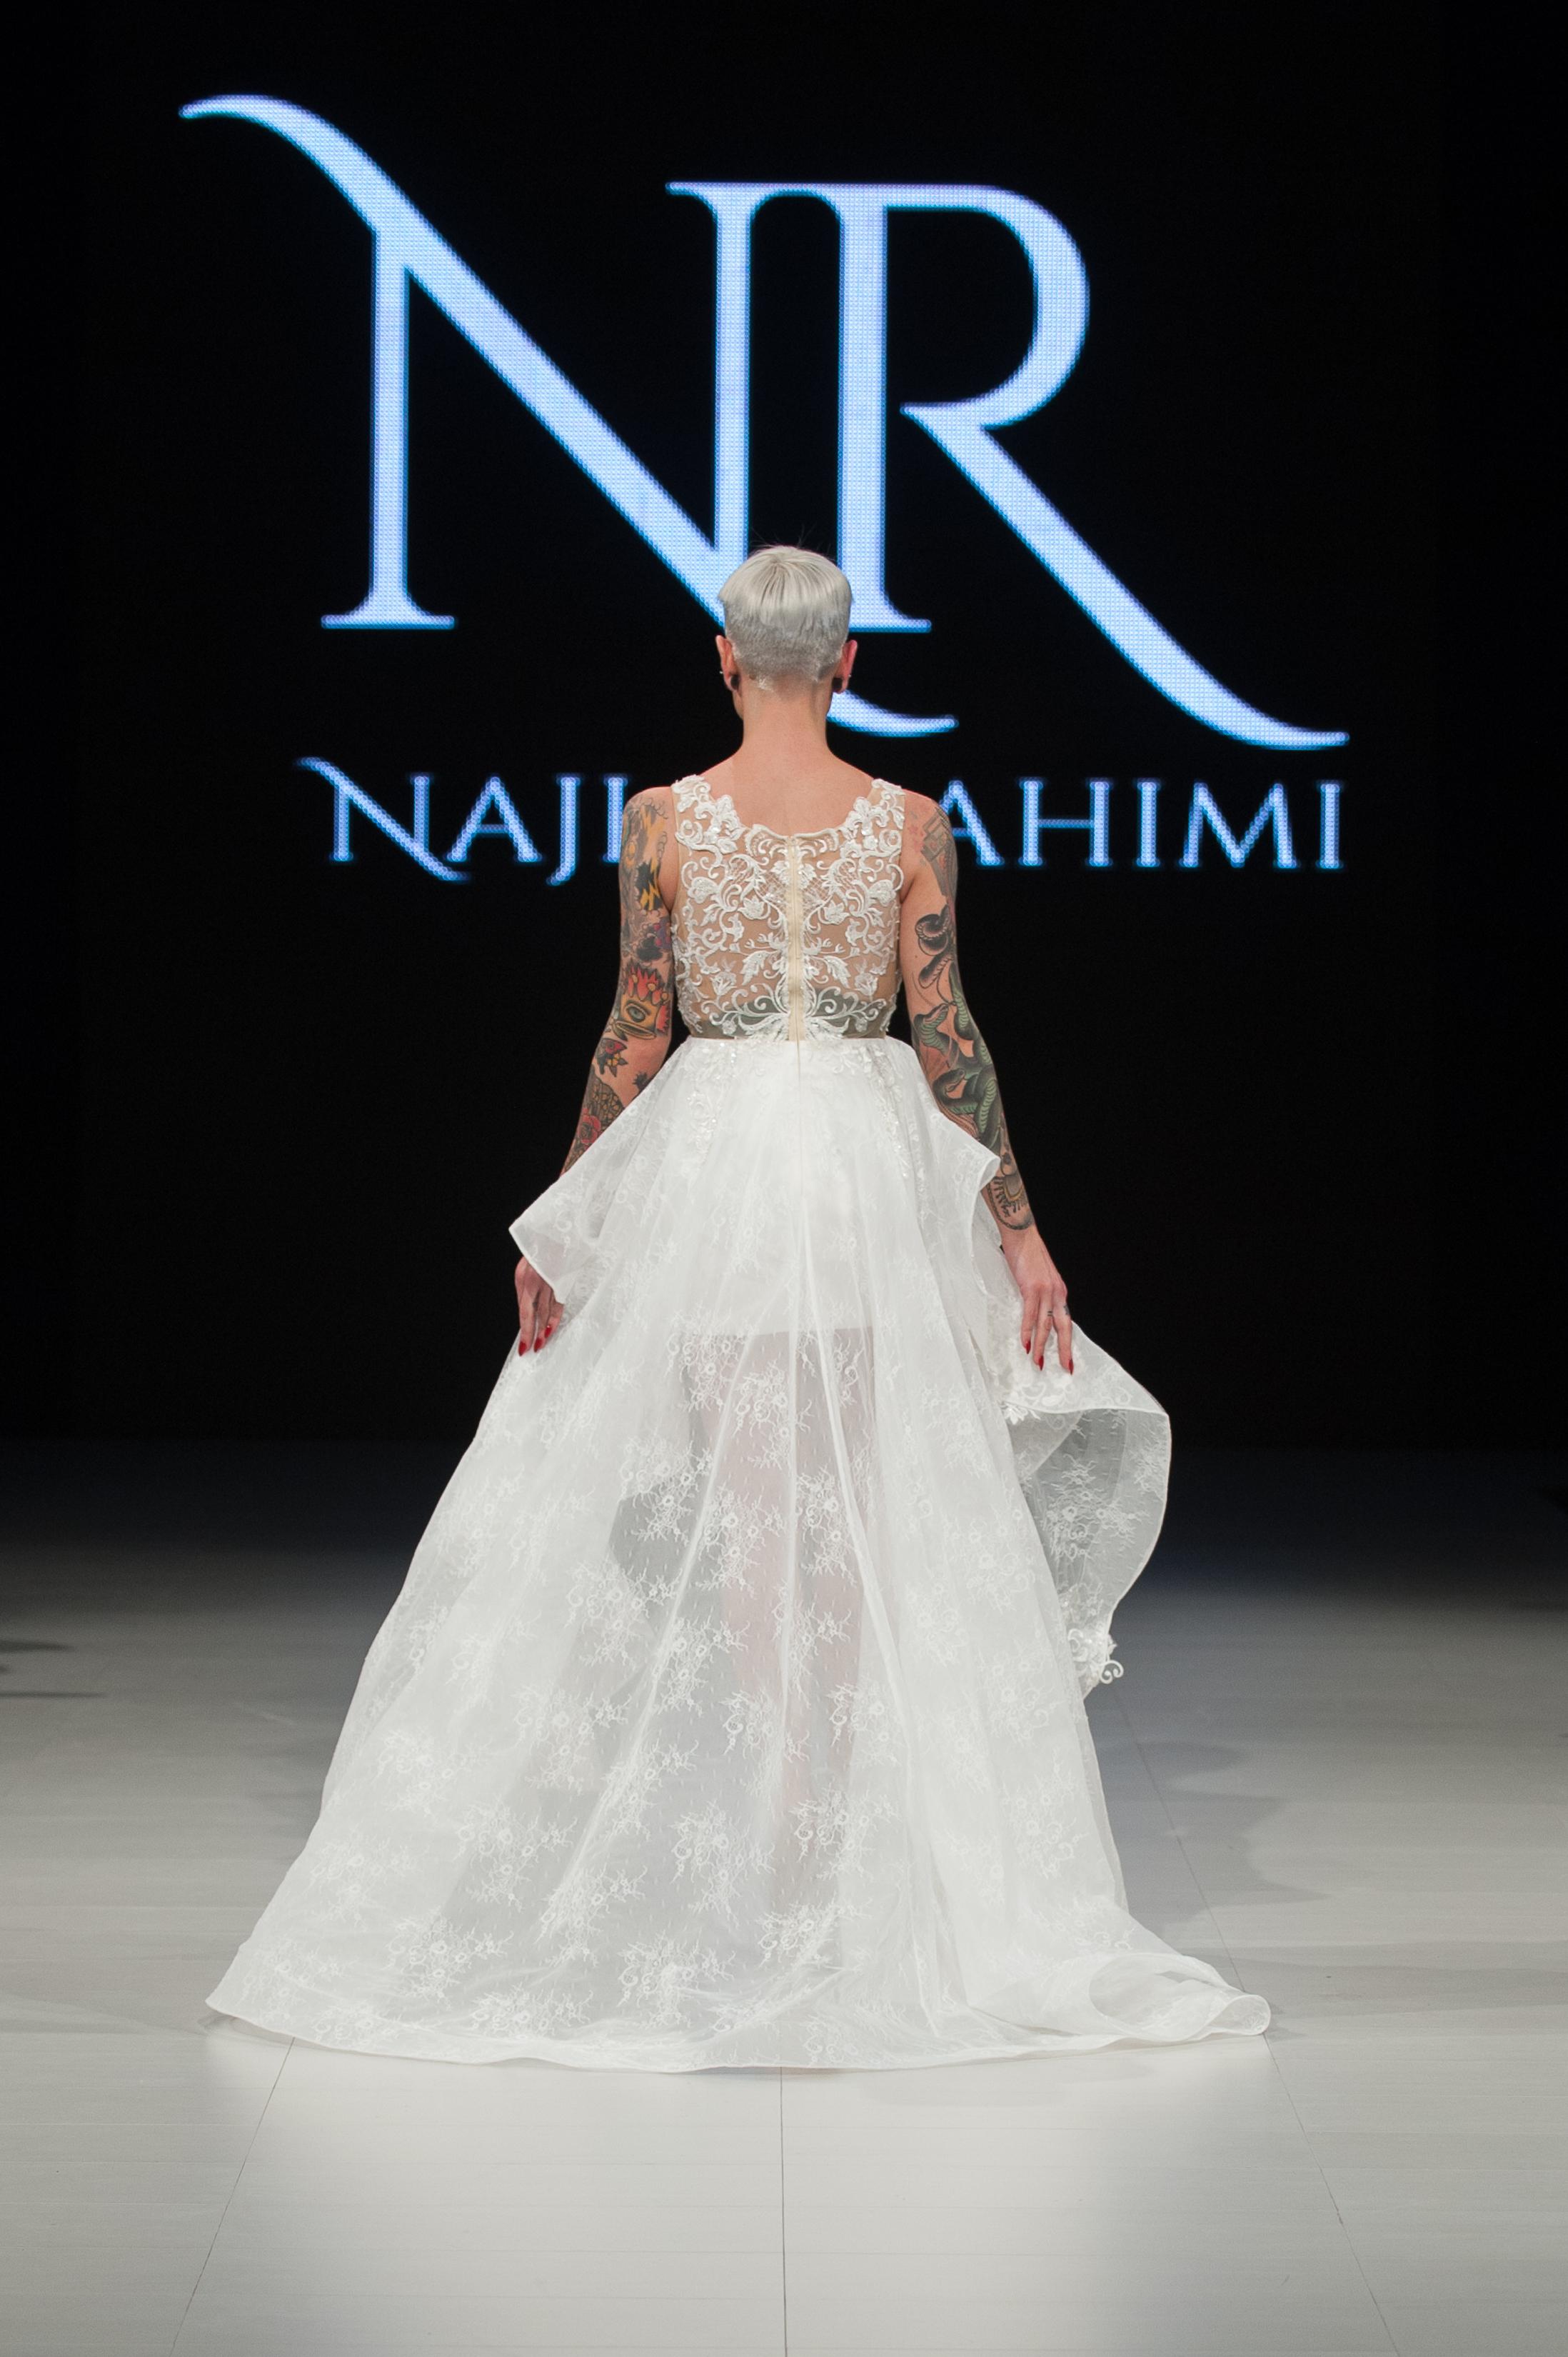 FAT2018-Day1-April17-Najla_Rahimi-Runway-Che_Rosales-LARAWAN-5939.jpg